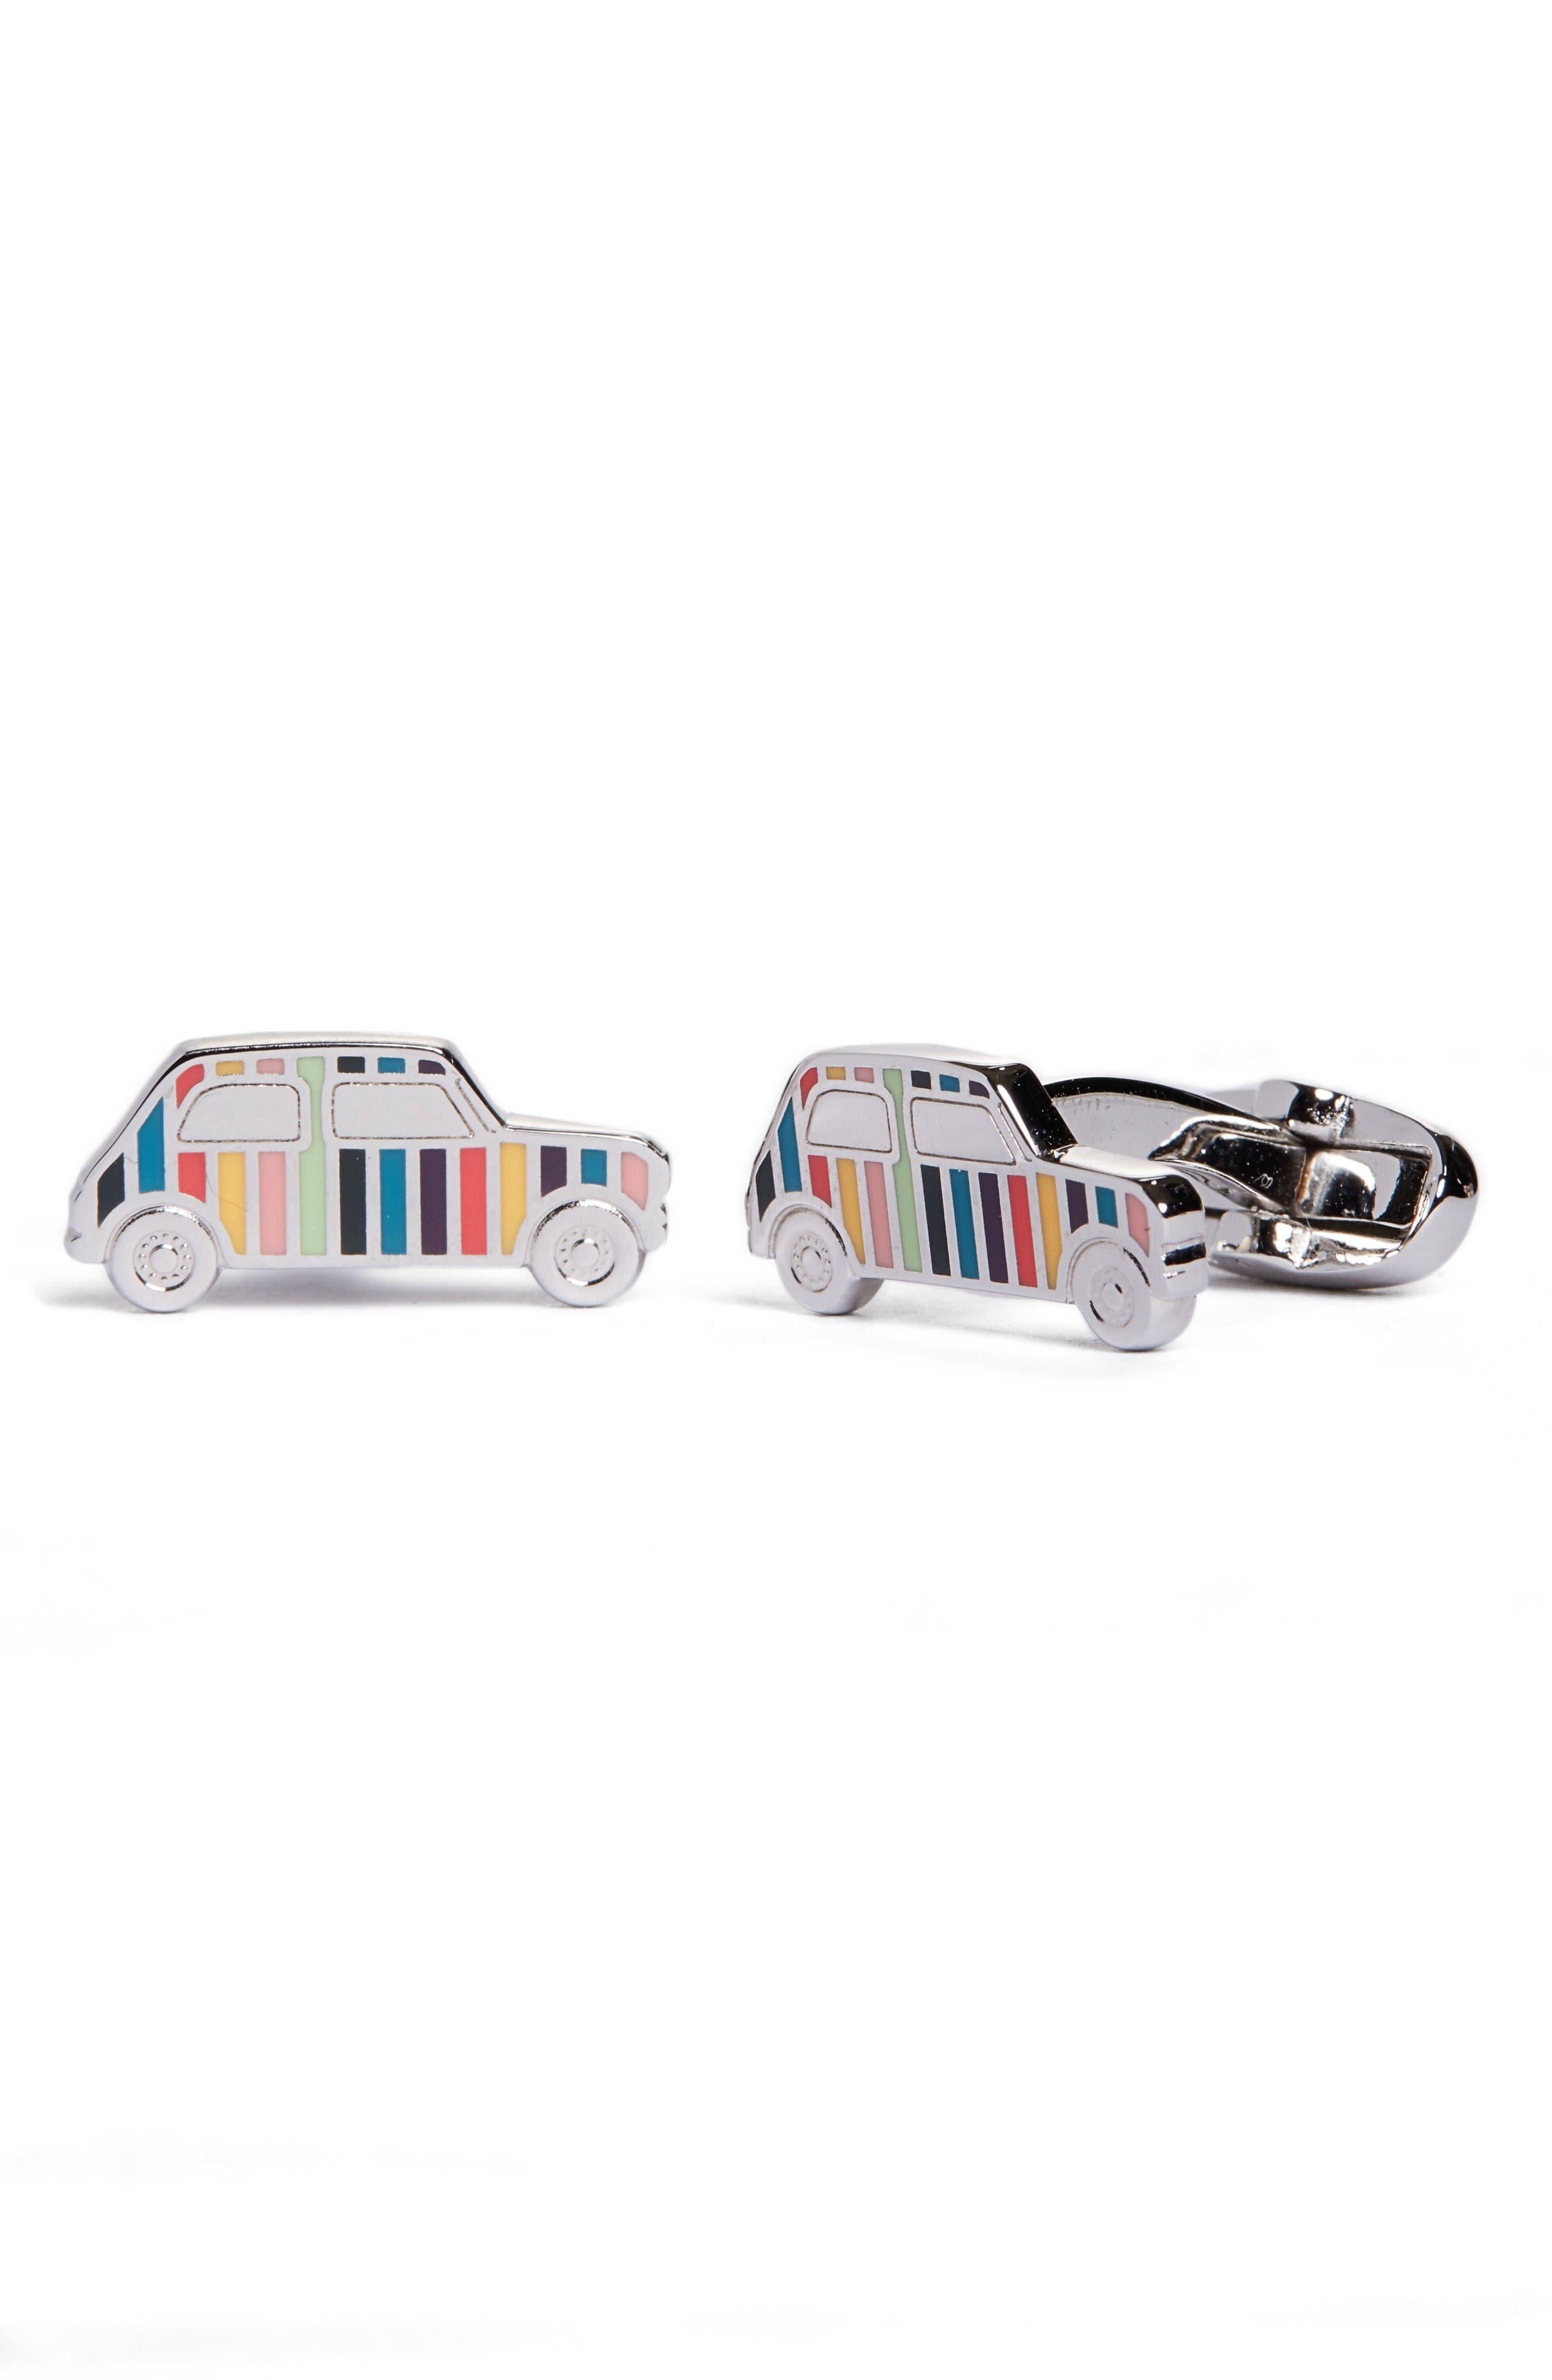 Enamel Stripe Car Cuff Links,                             Main thumbnail 1, color,                             METALLIC SILVER